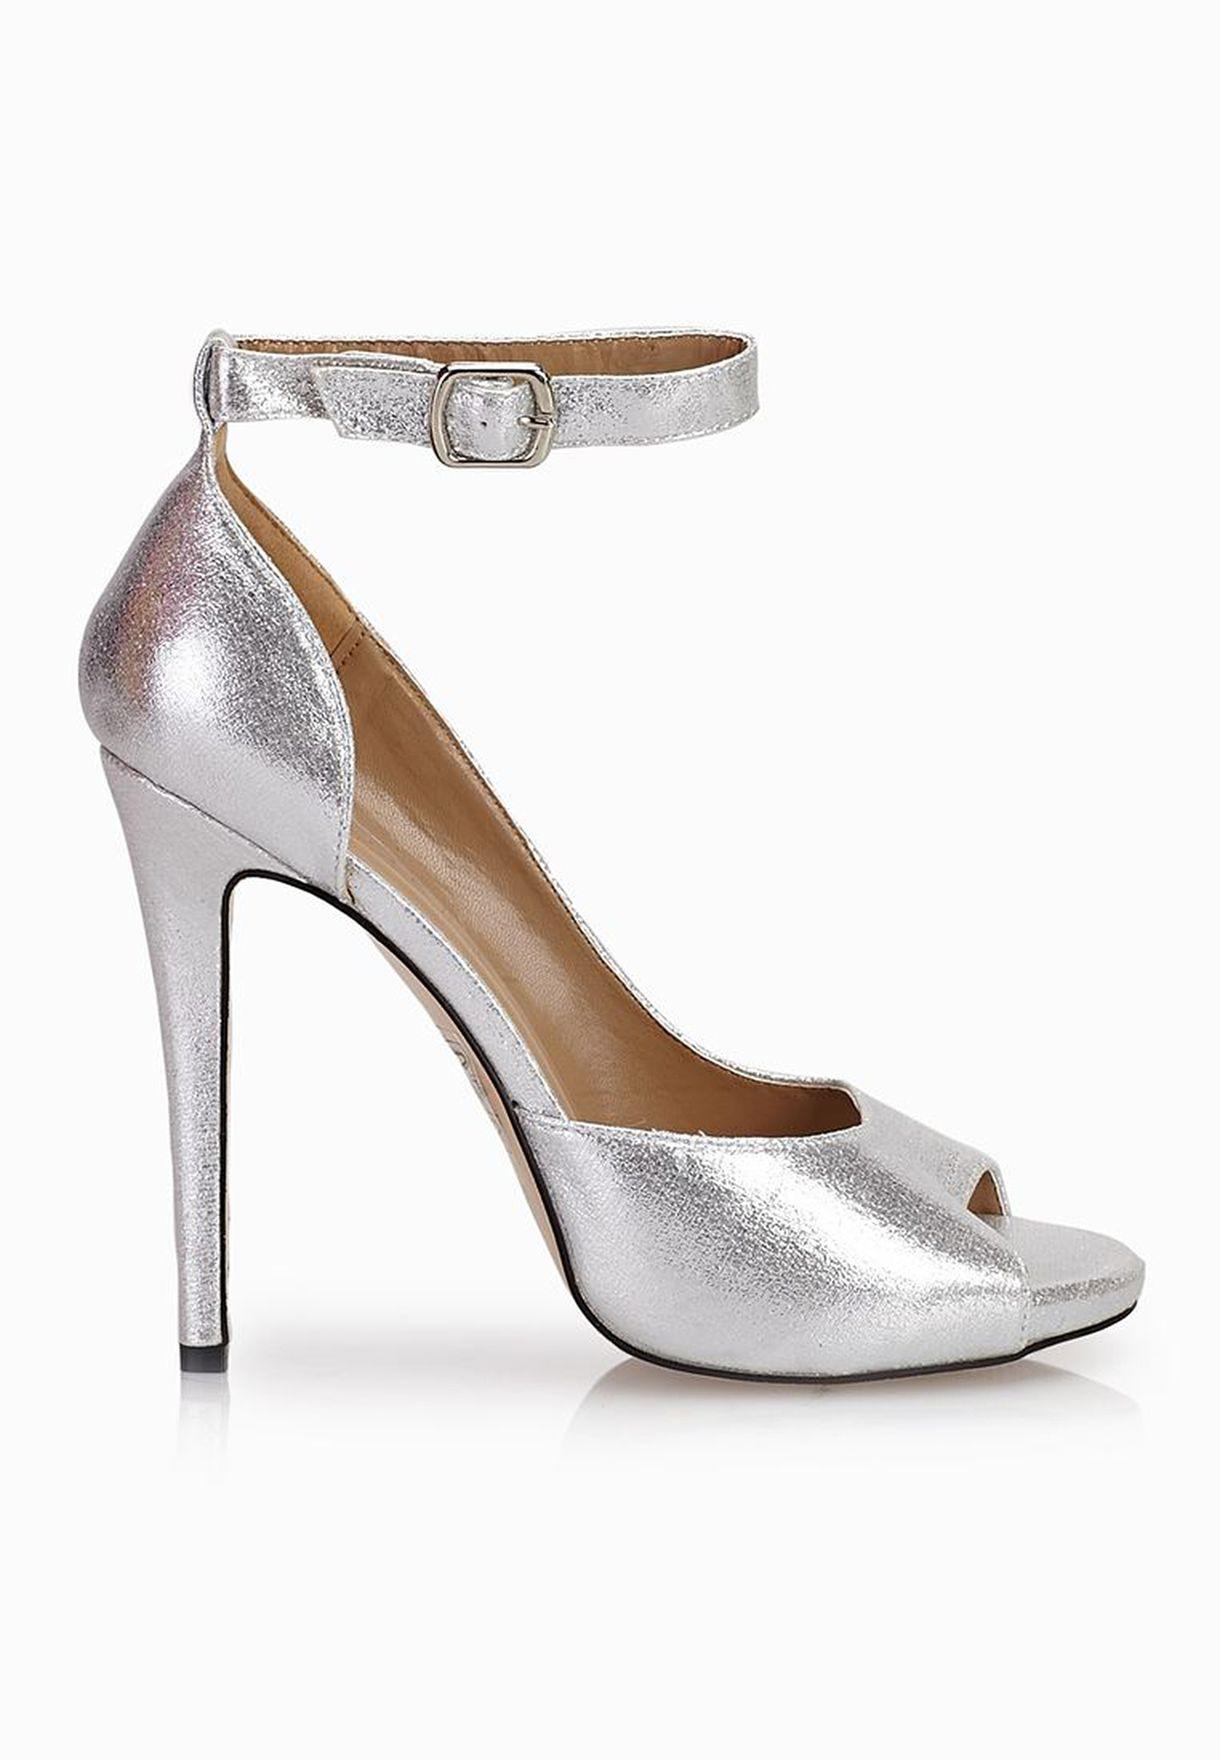 3b88463d31a Shop Truffle silver Ankle Strap Cut Out Peep Toe Sandals for Women ...